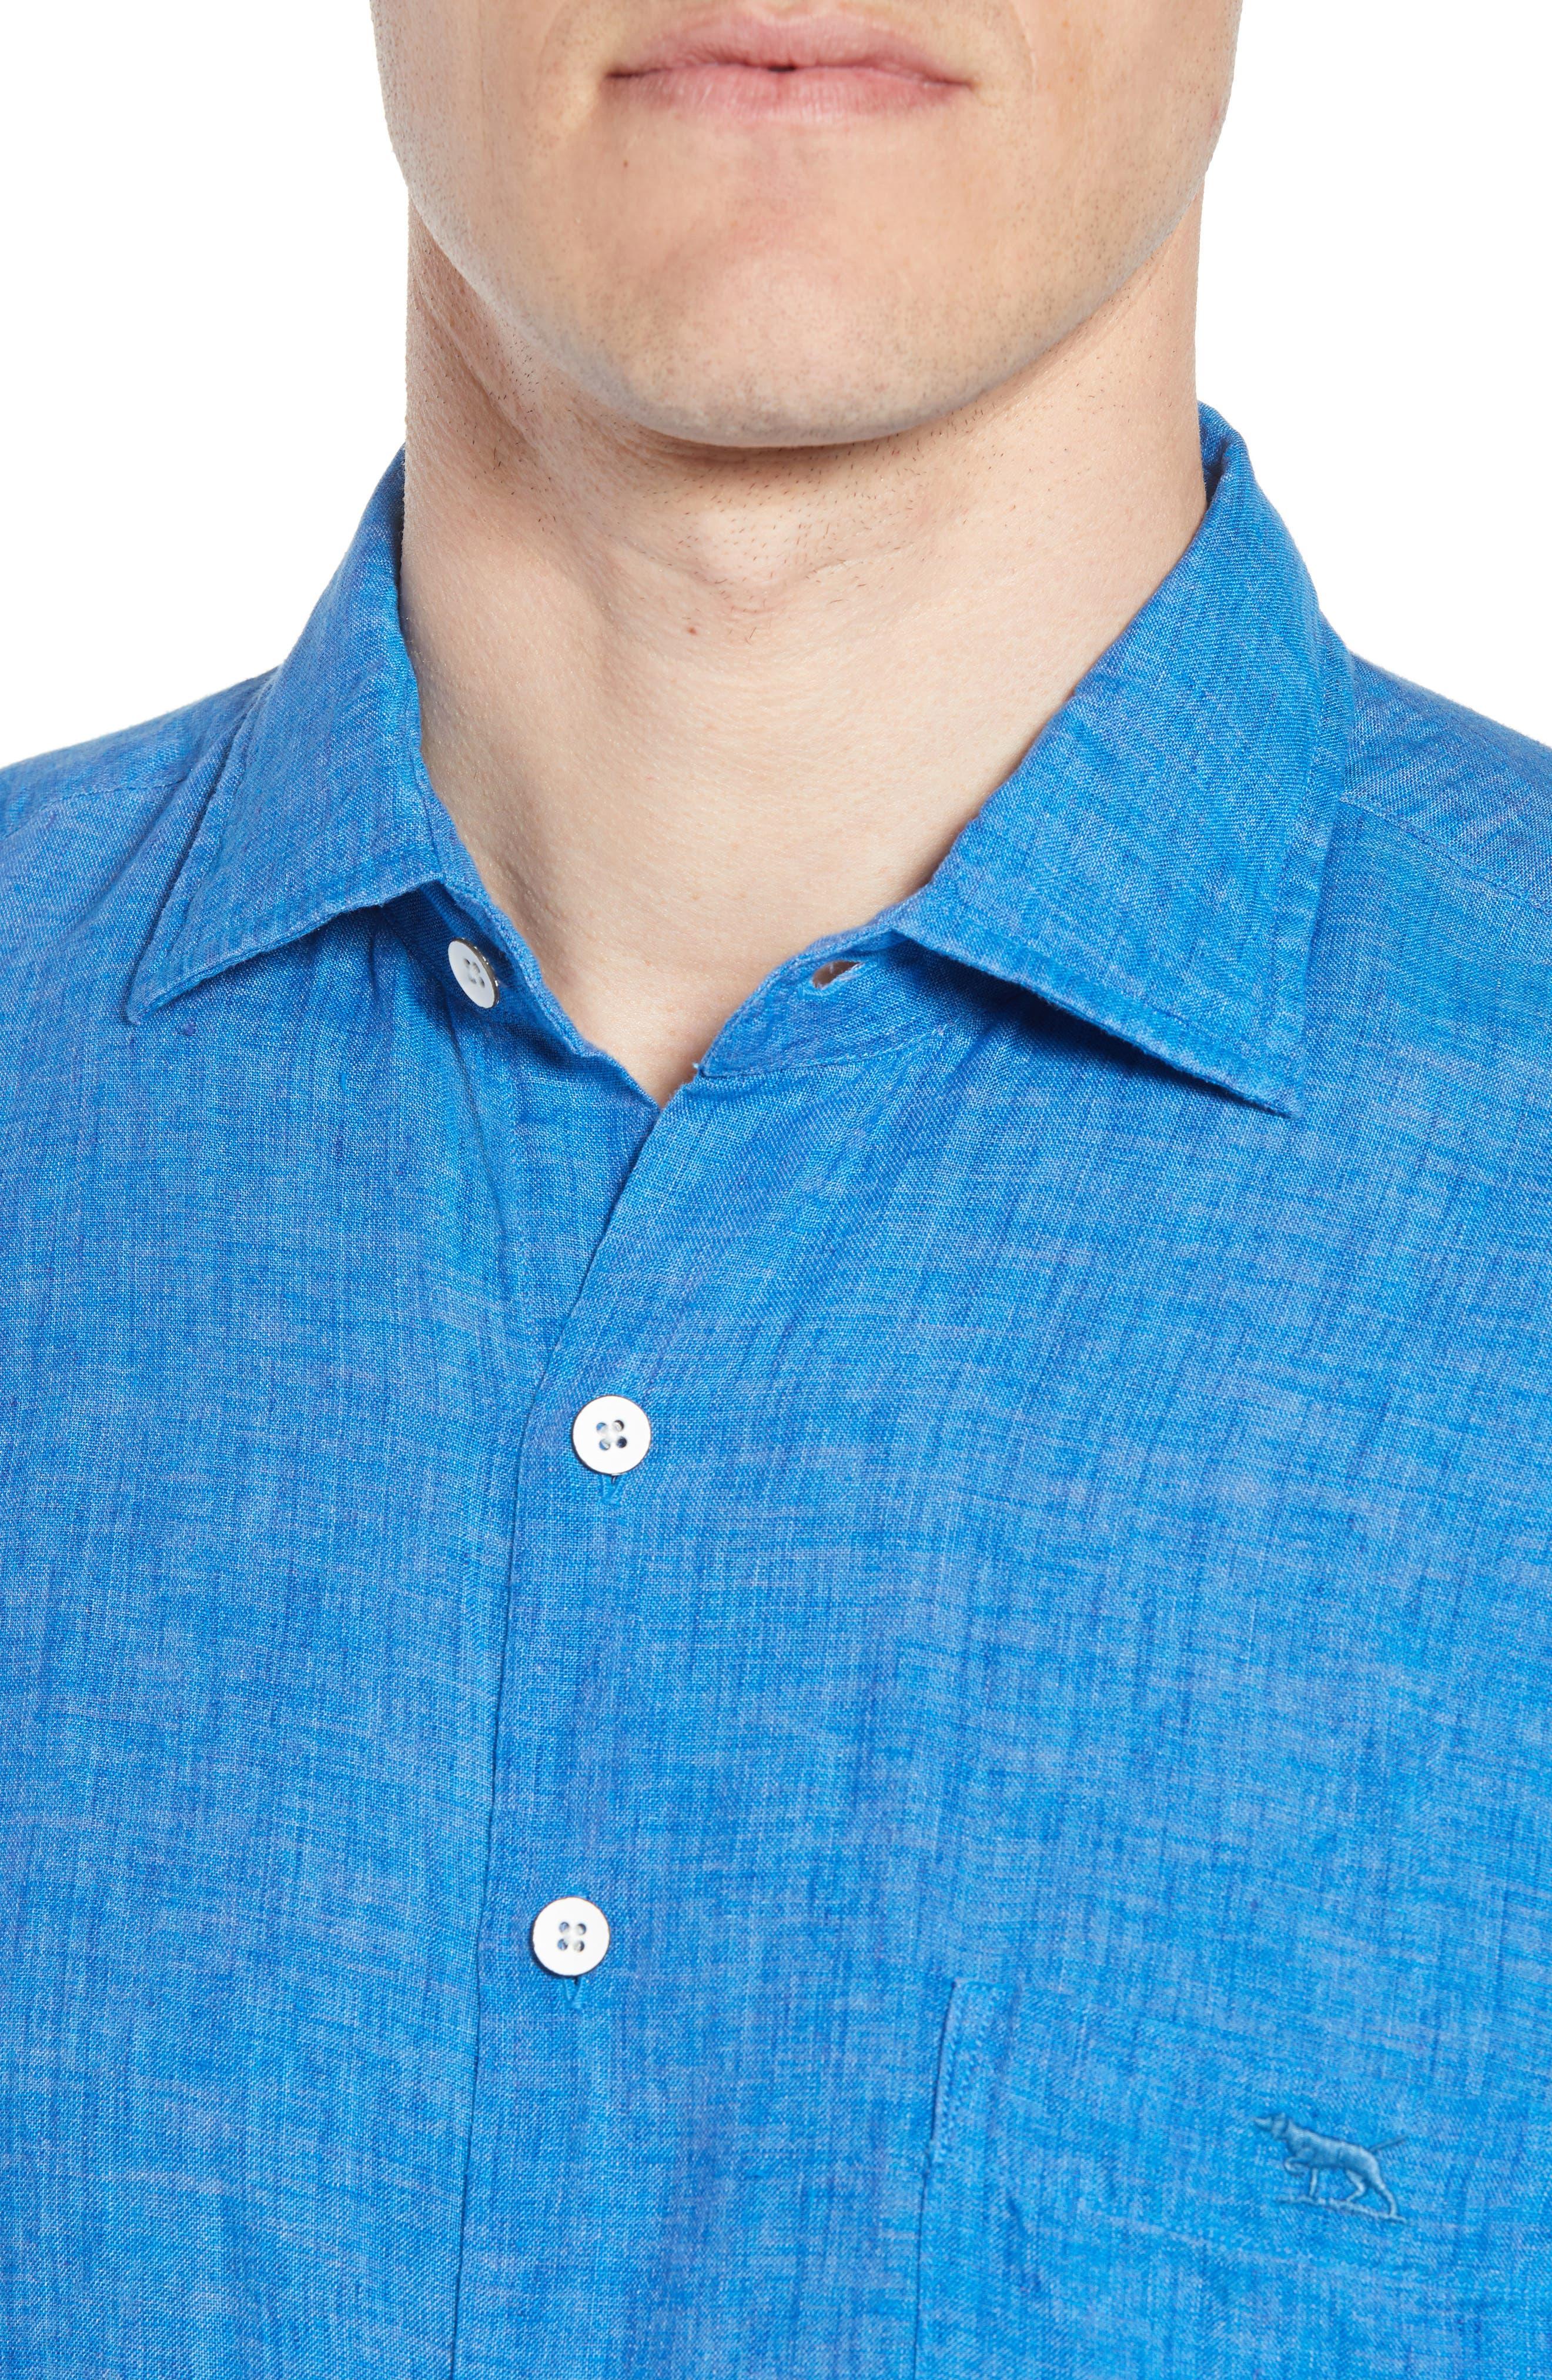 RODD & GUNN,                             Harris Bay Regular Fit Linen Sport Shirt,                             Alternate thumbnail 4, color,                             438